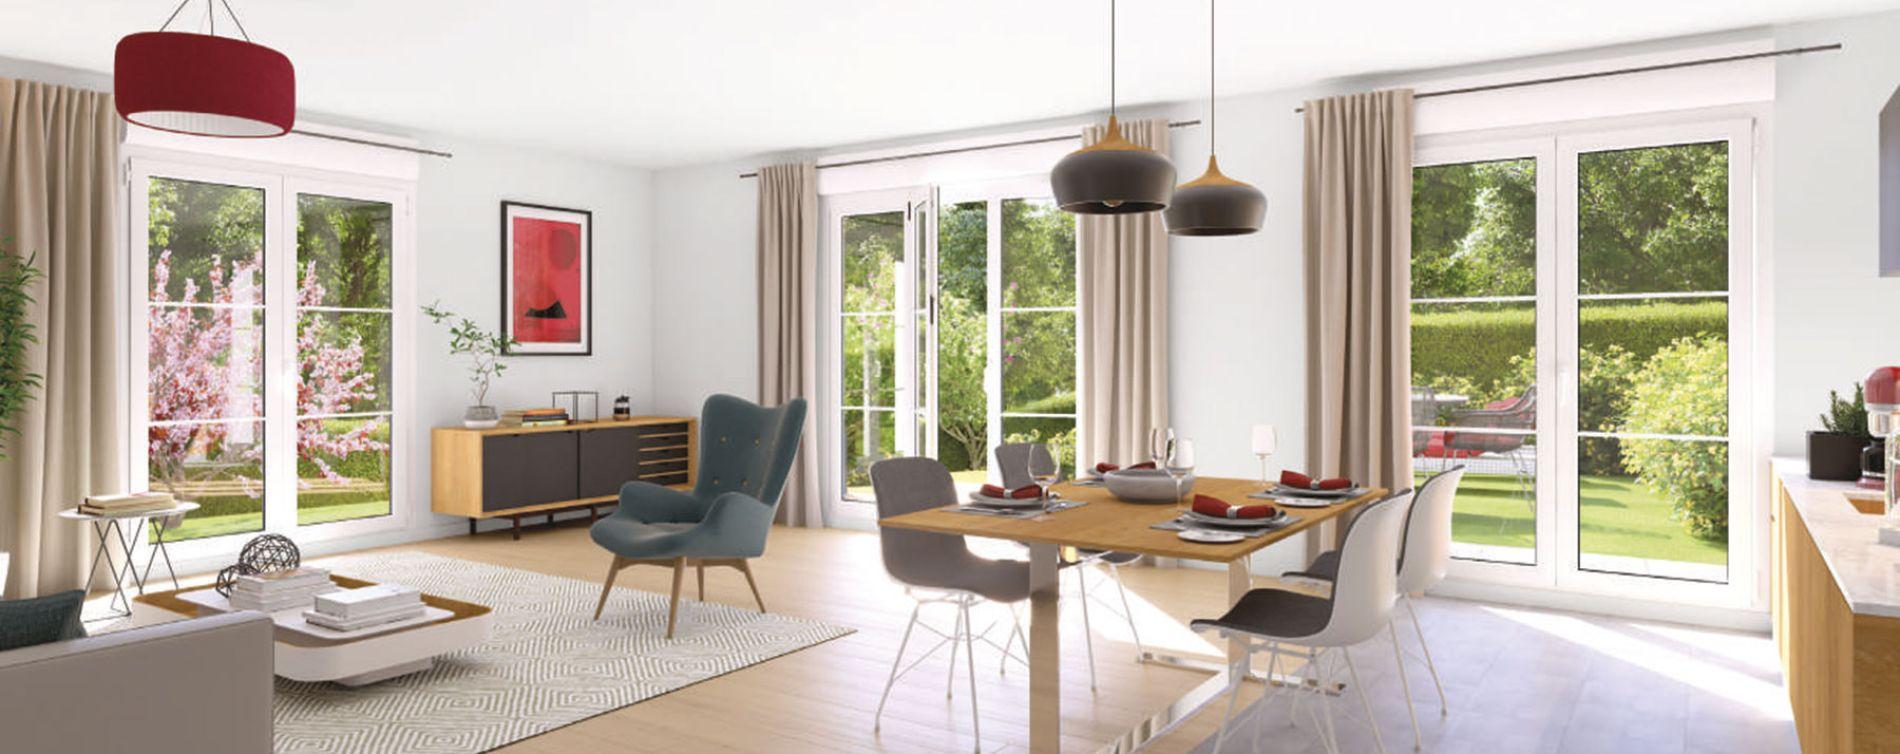 Gagny : programme immobilier neuve « Symphonie » (3)